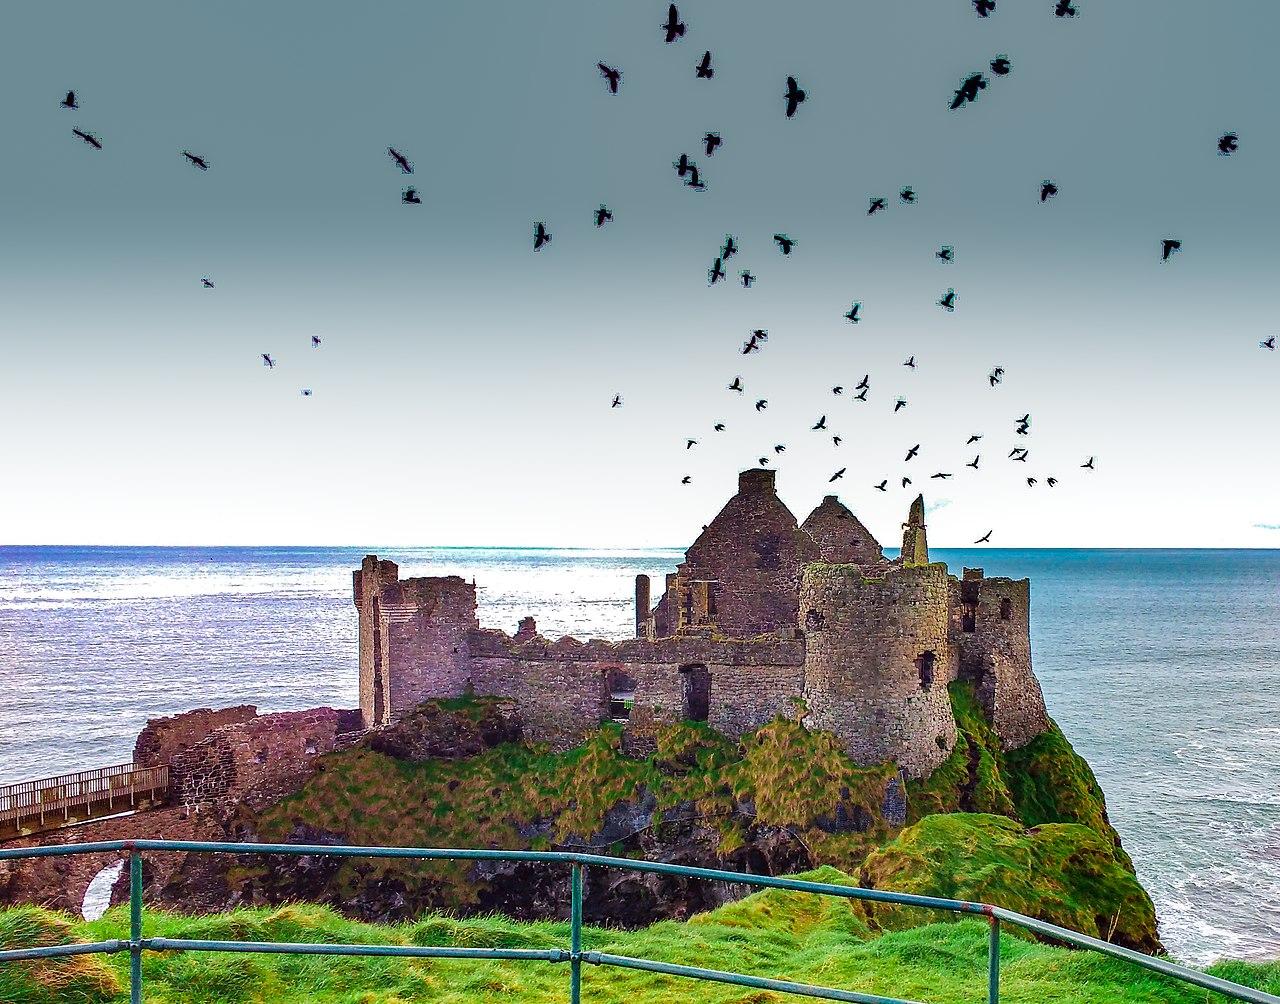 Birds flocking above dunluce castle